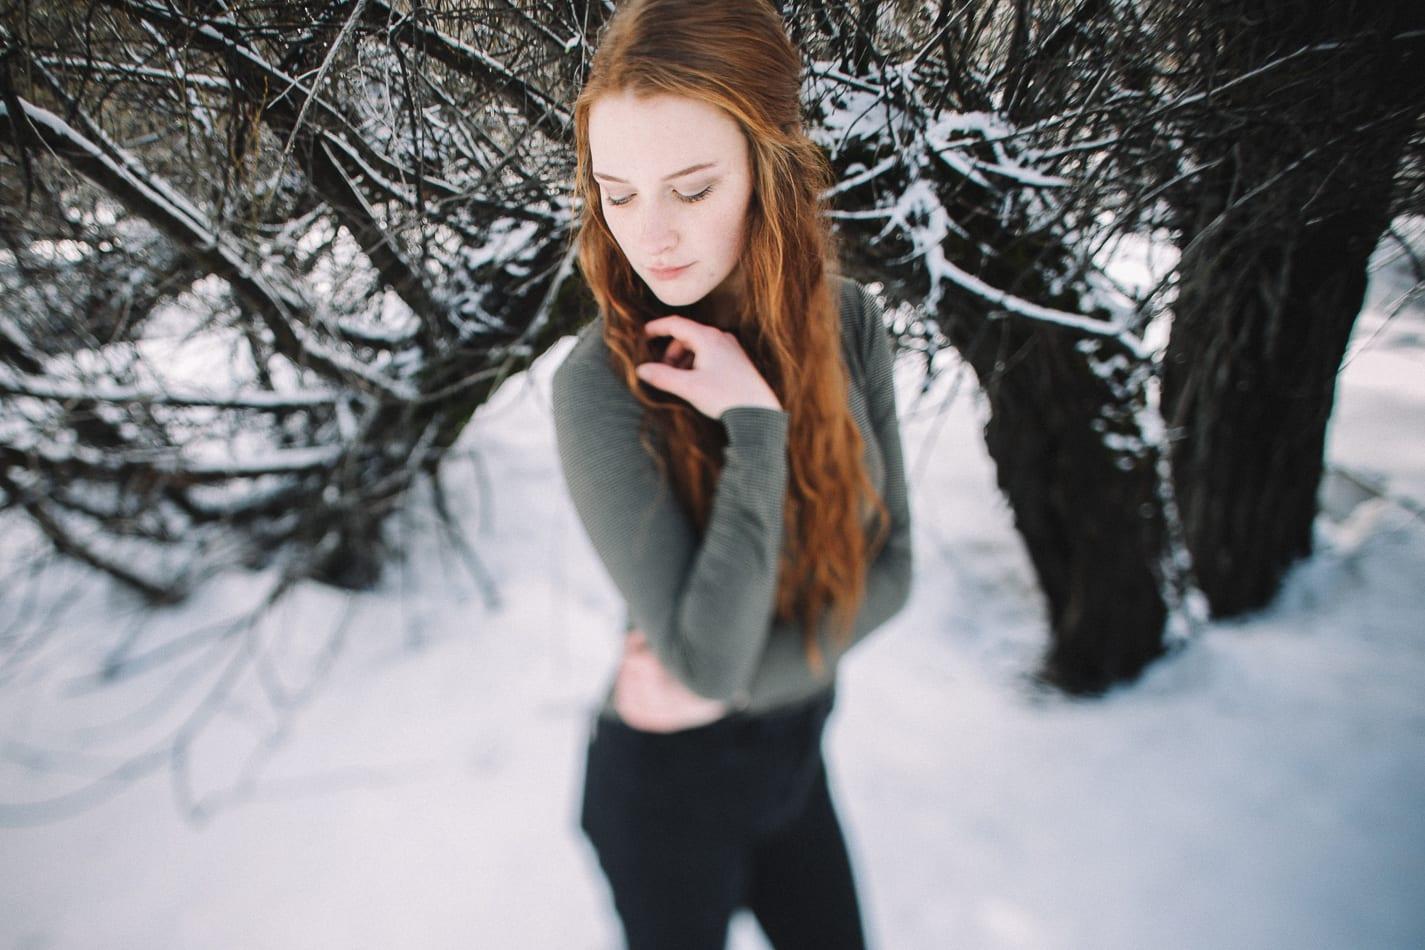 mount-lassen-winter-portrait-photo-7